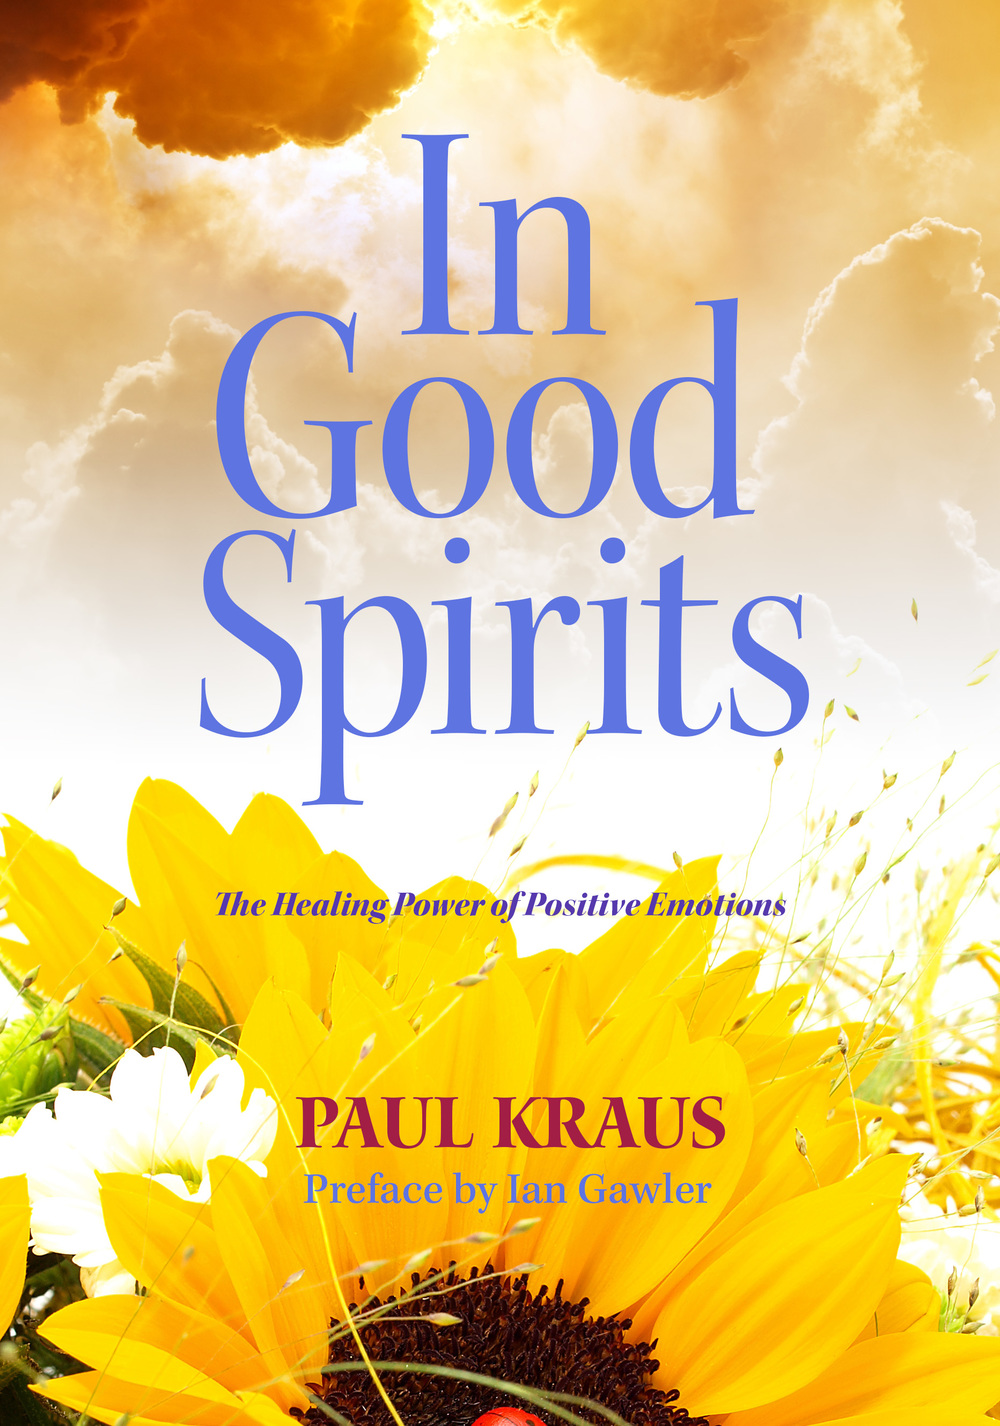 In Good Spirits cover 04.jpg